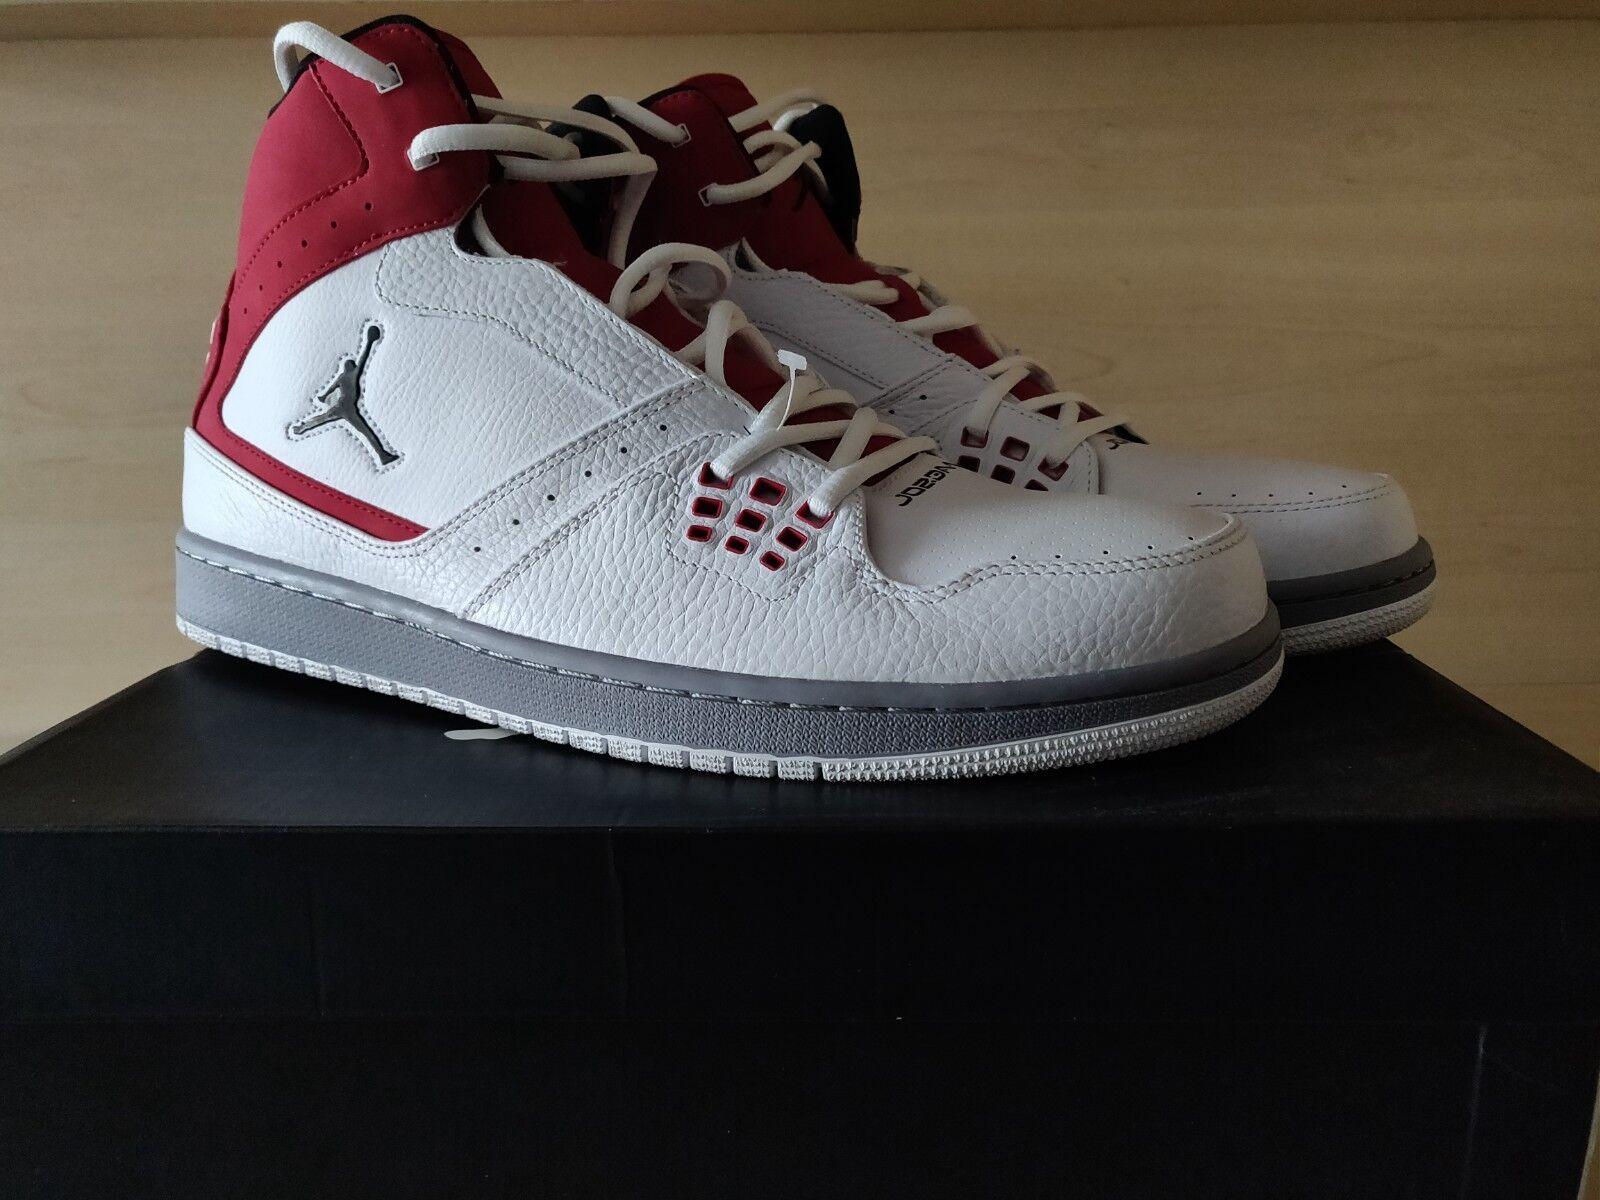 Jordan Fligero 1  13, rojo y negro.